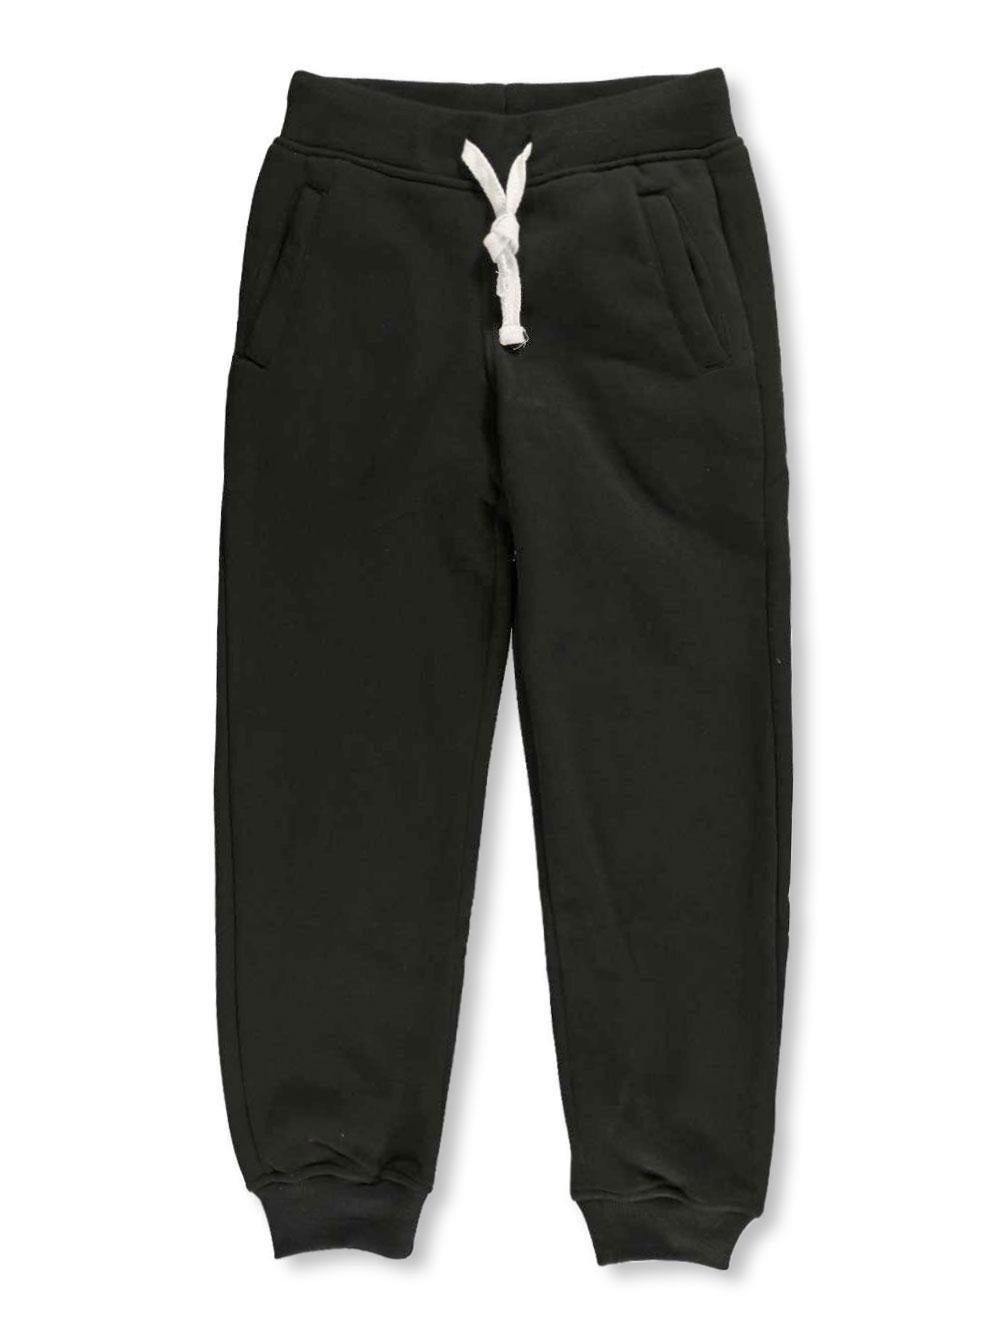 Image of SP Active Big Boys Jogger Sweatpants Sizes 8  20  black 18  20